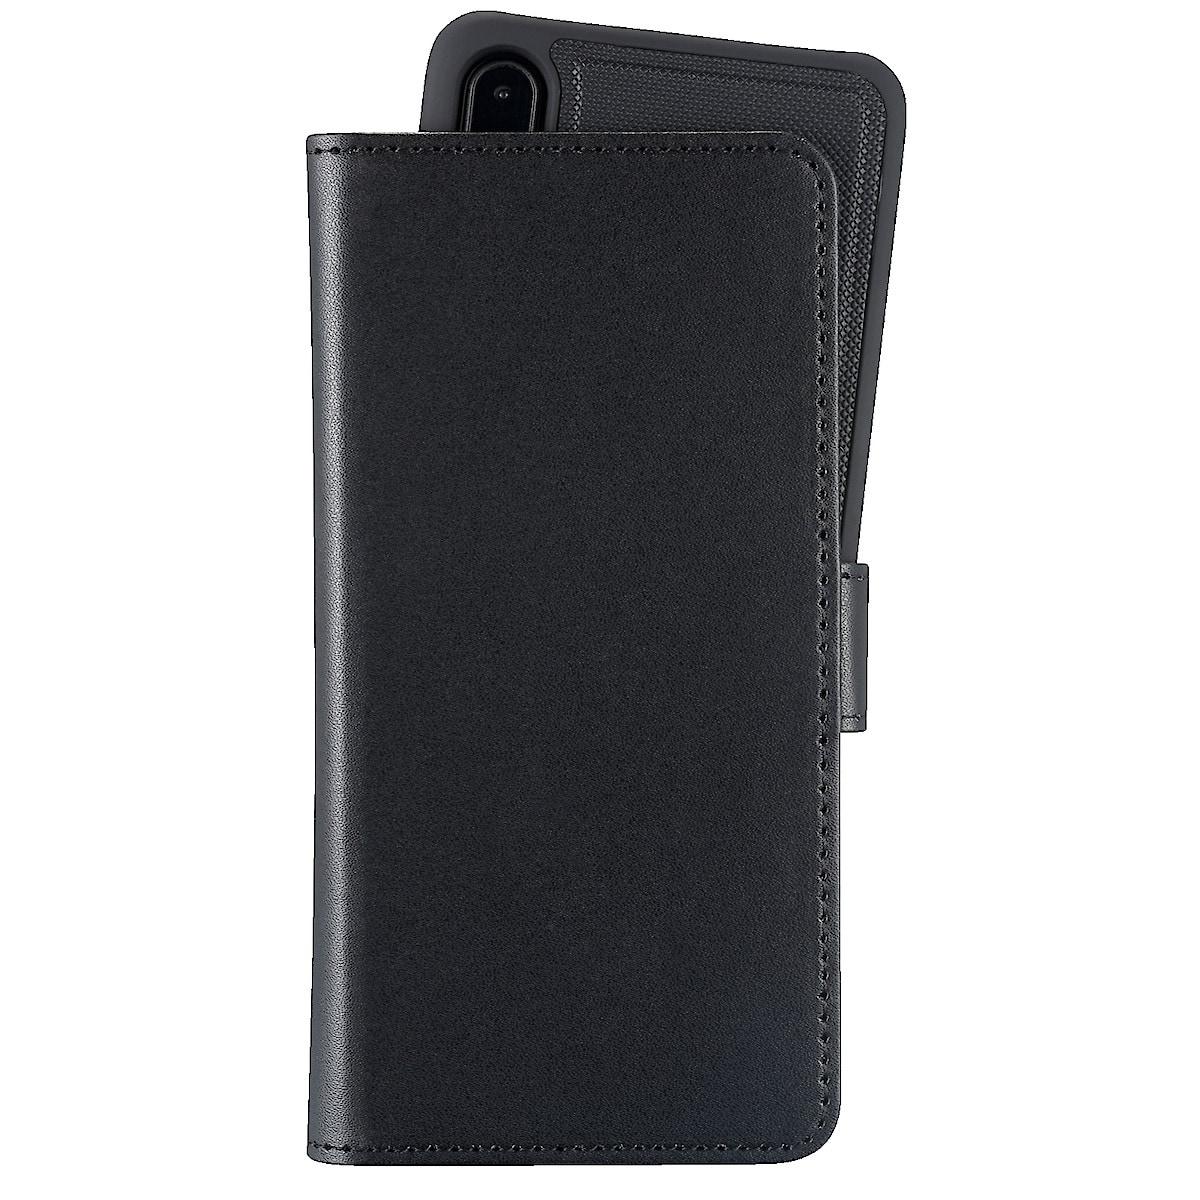 Plånboksfodral för Huawei P30 Lite Holdit